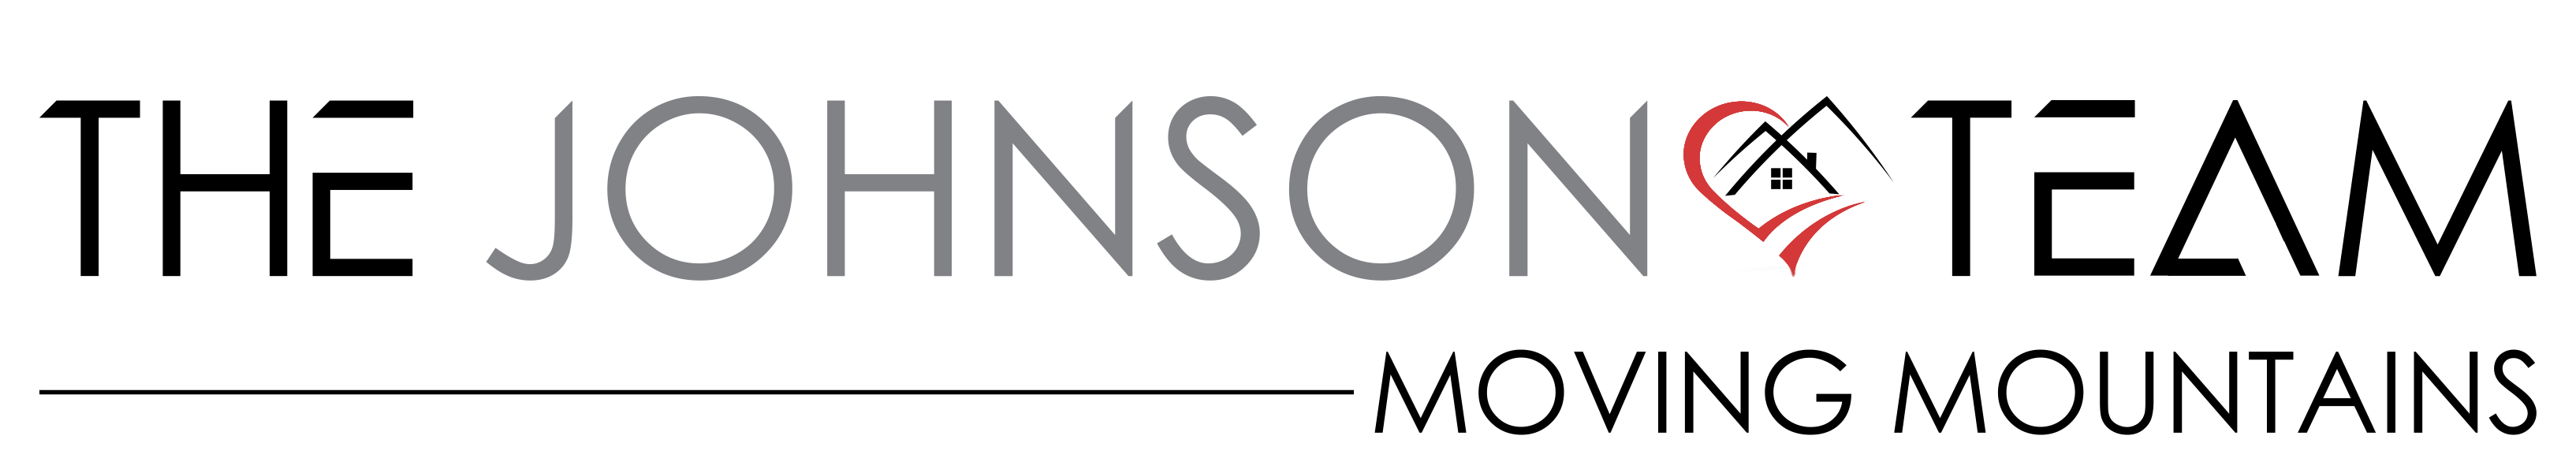 The Johnson Team logo